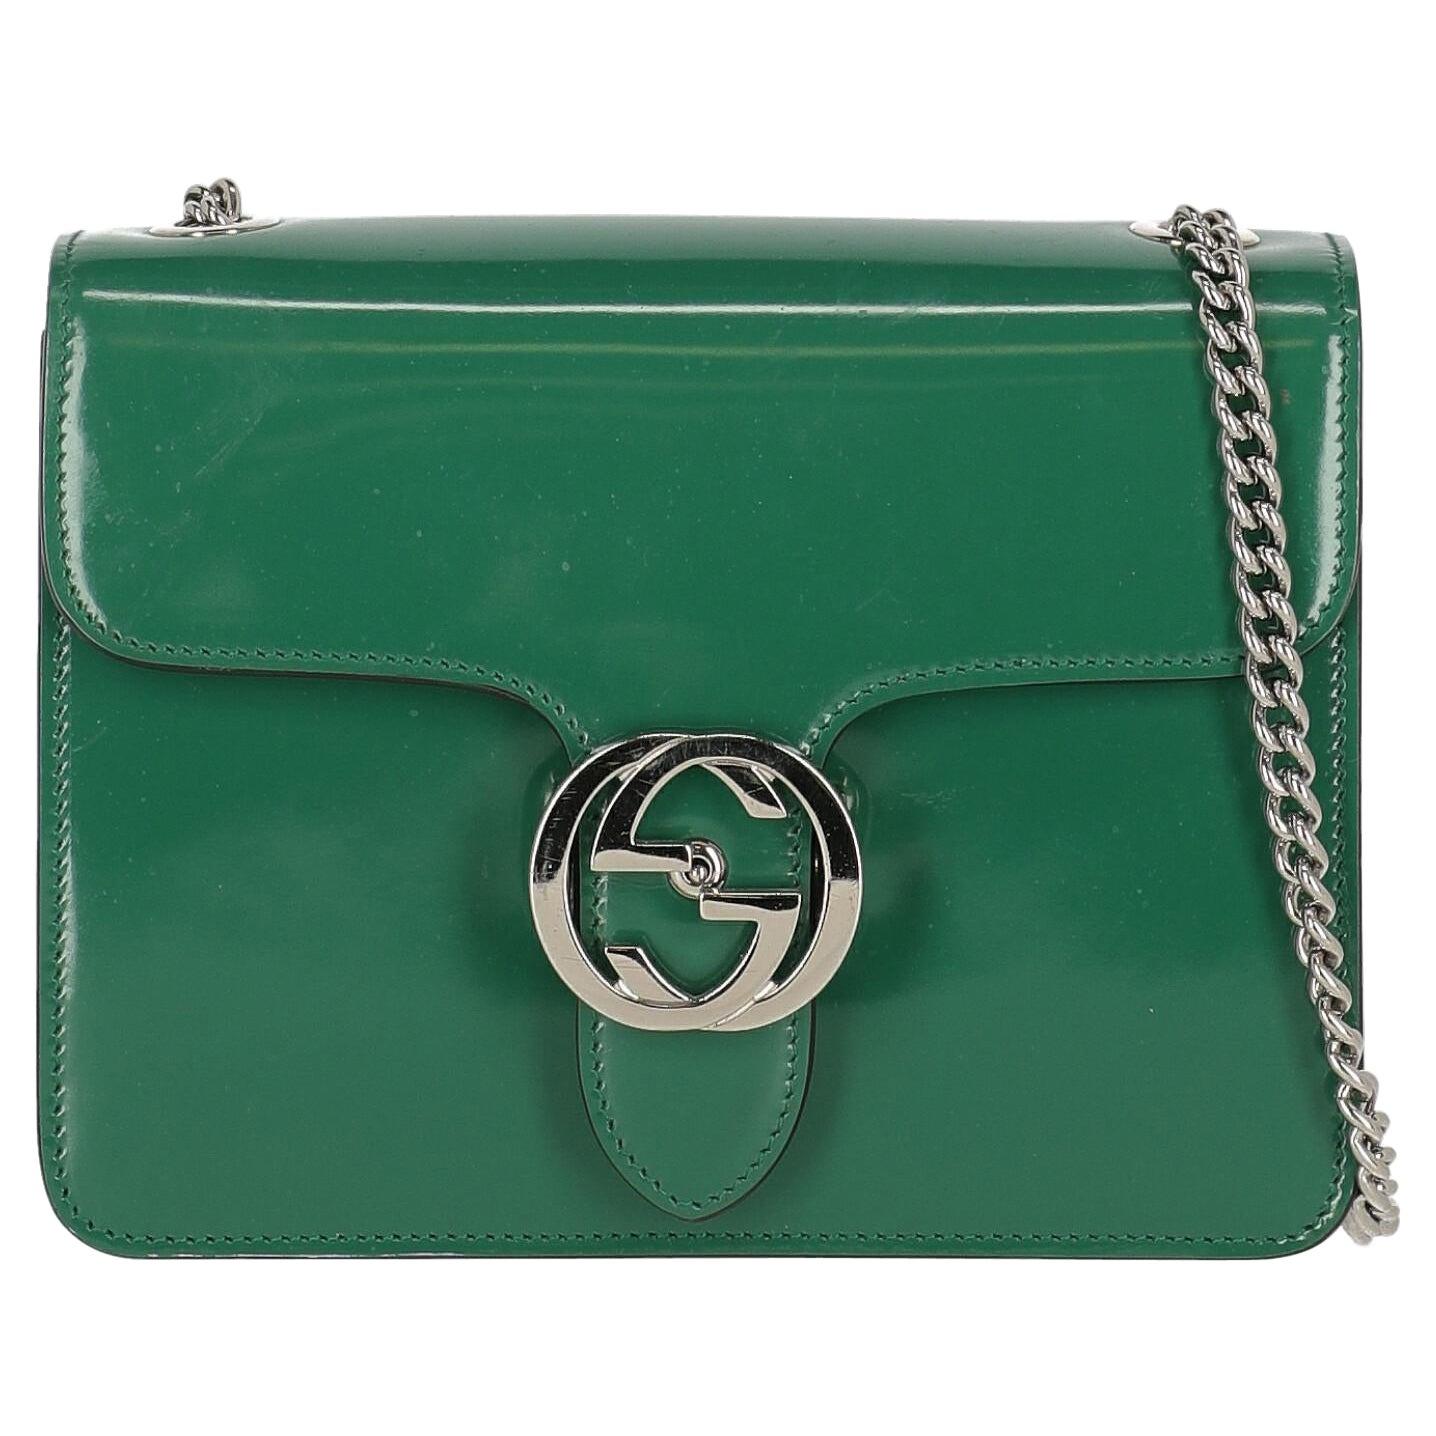 """Gucci Women Shoulder bags Interlocking Green Leather """